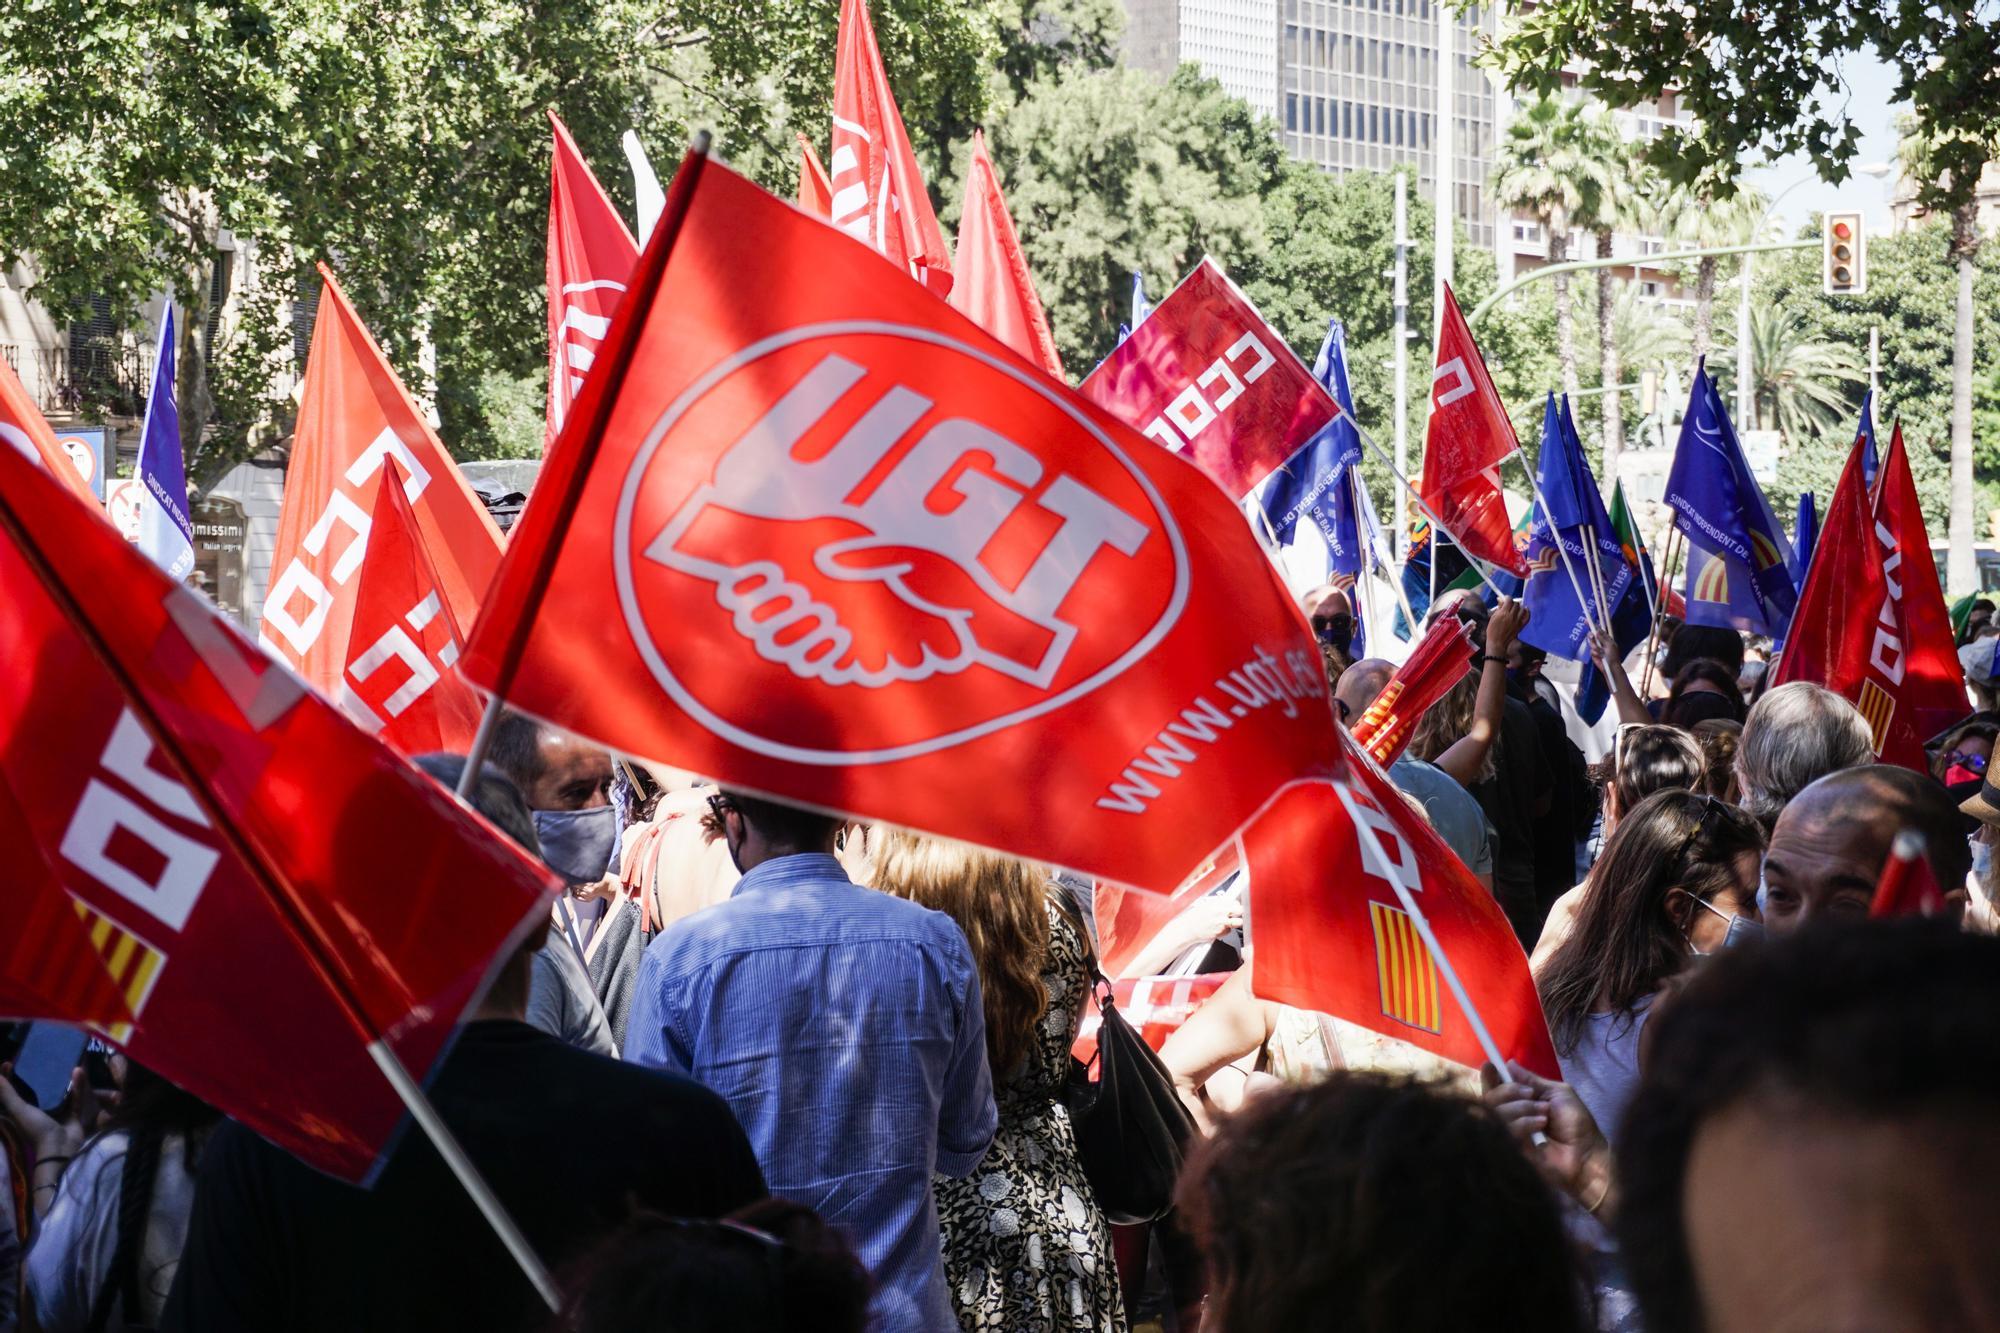 Los trabajadores de Caixabank de Mallorca secundan la huelga